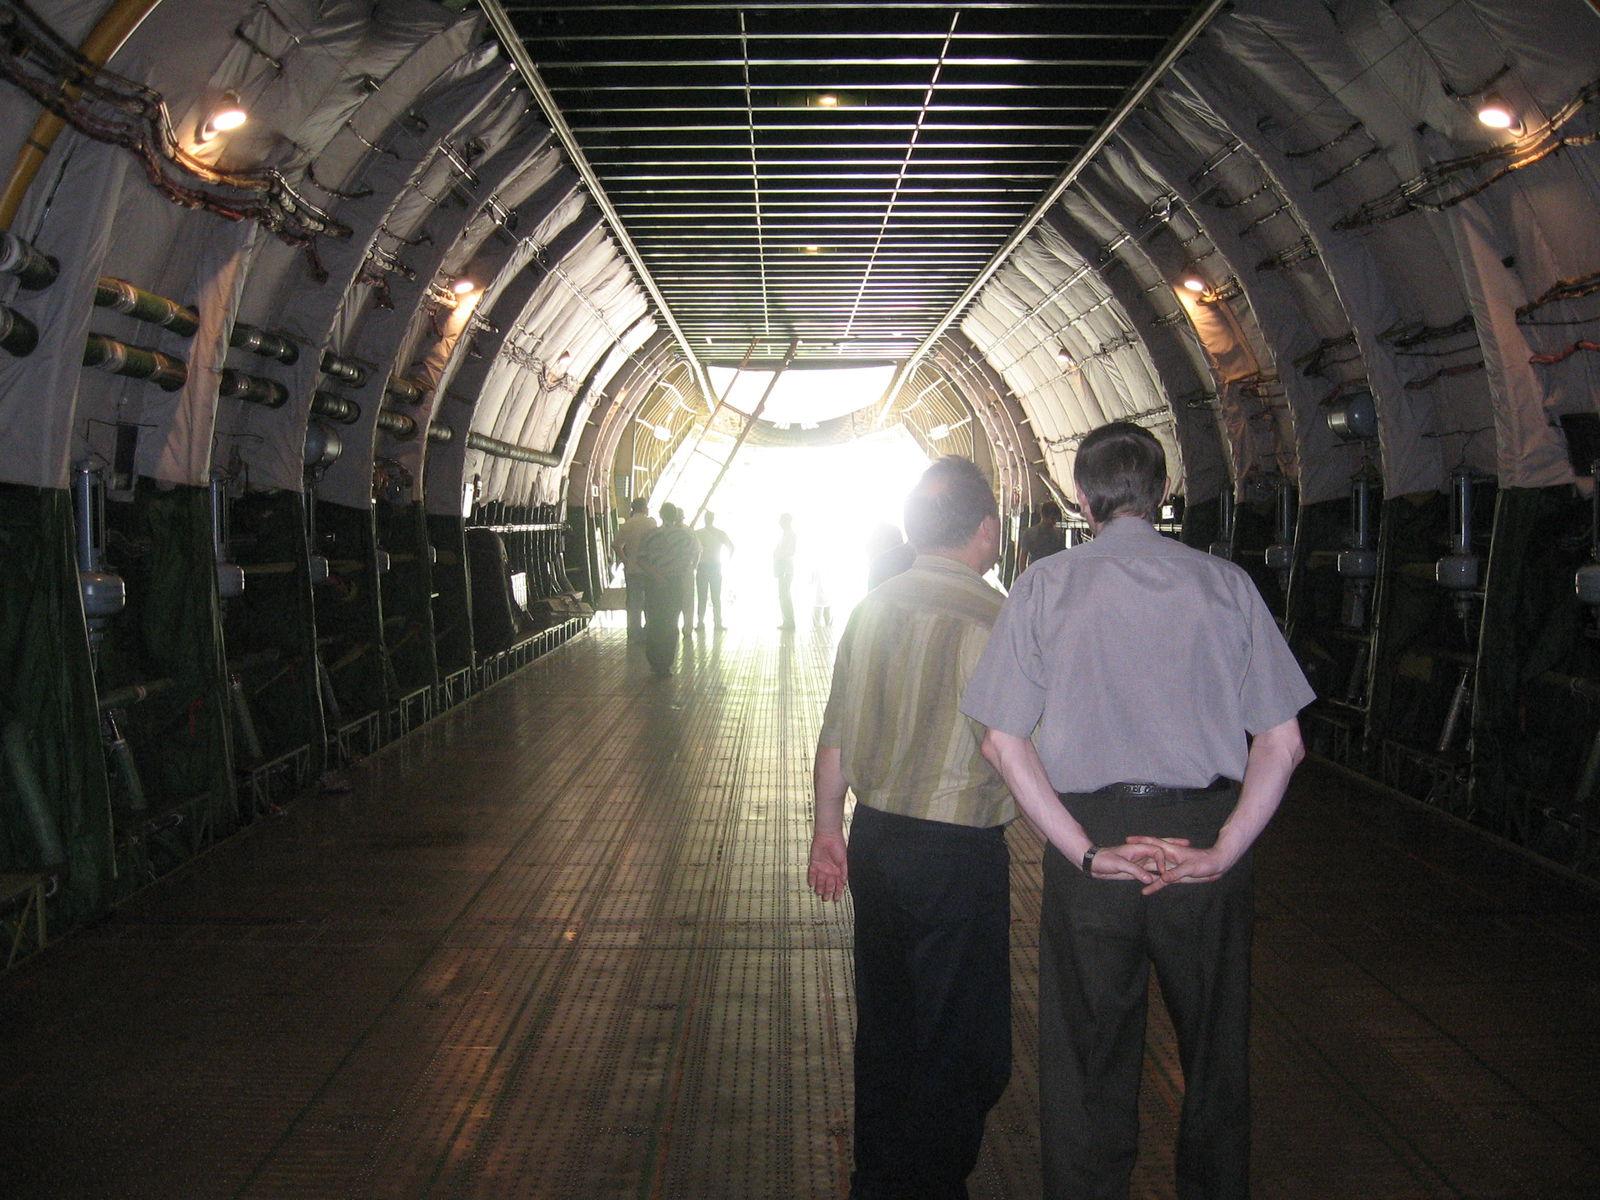 АН - 124 Руслан внутри грузового отсека